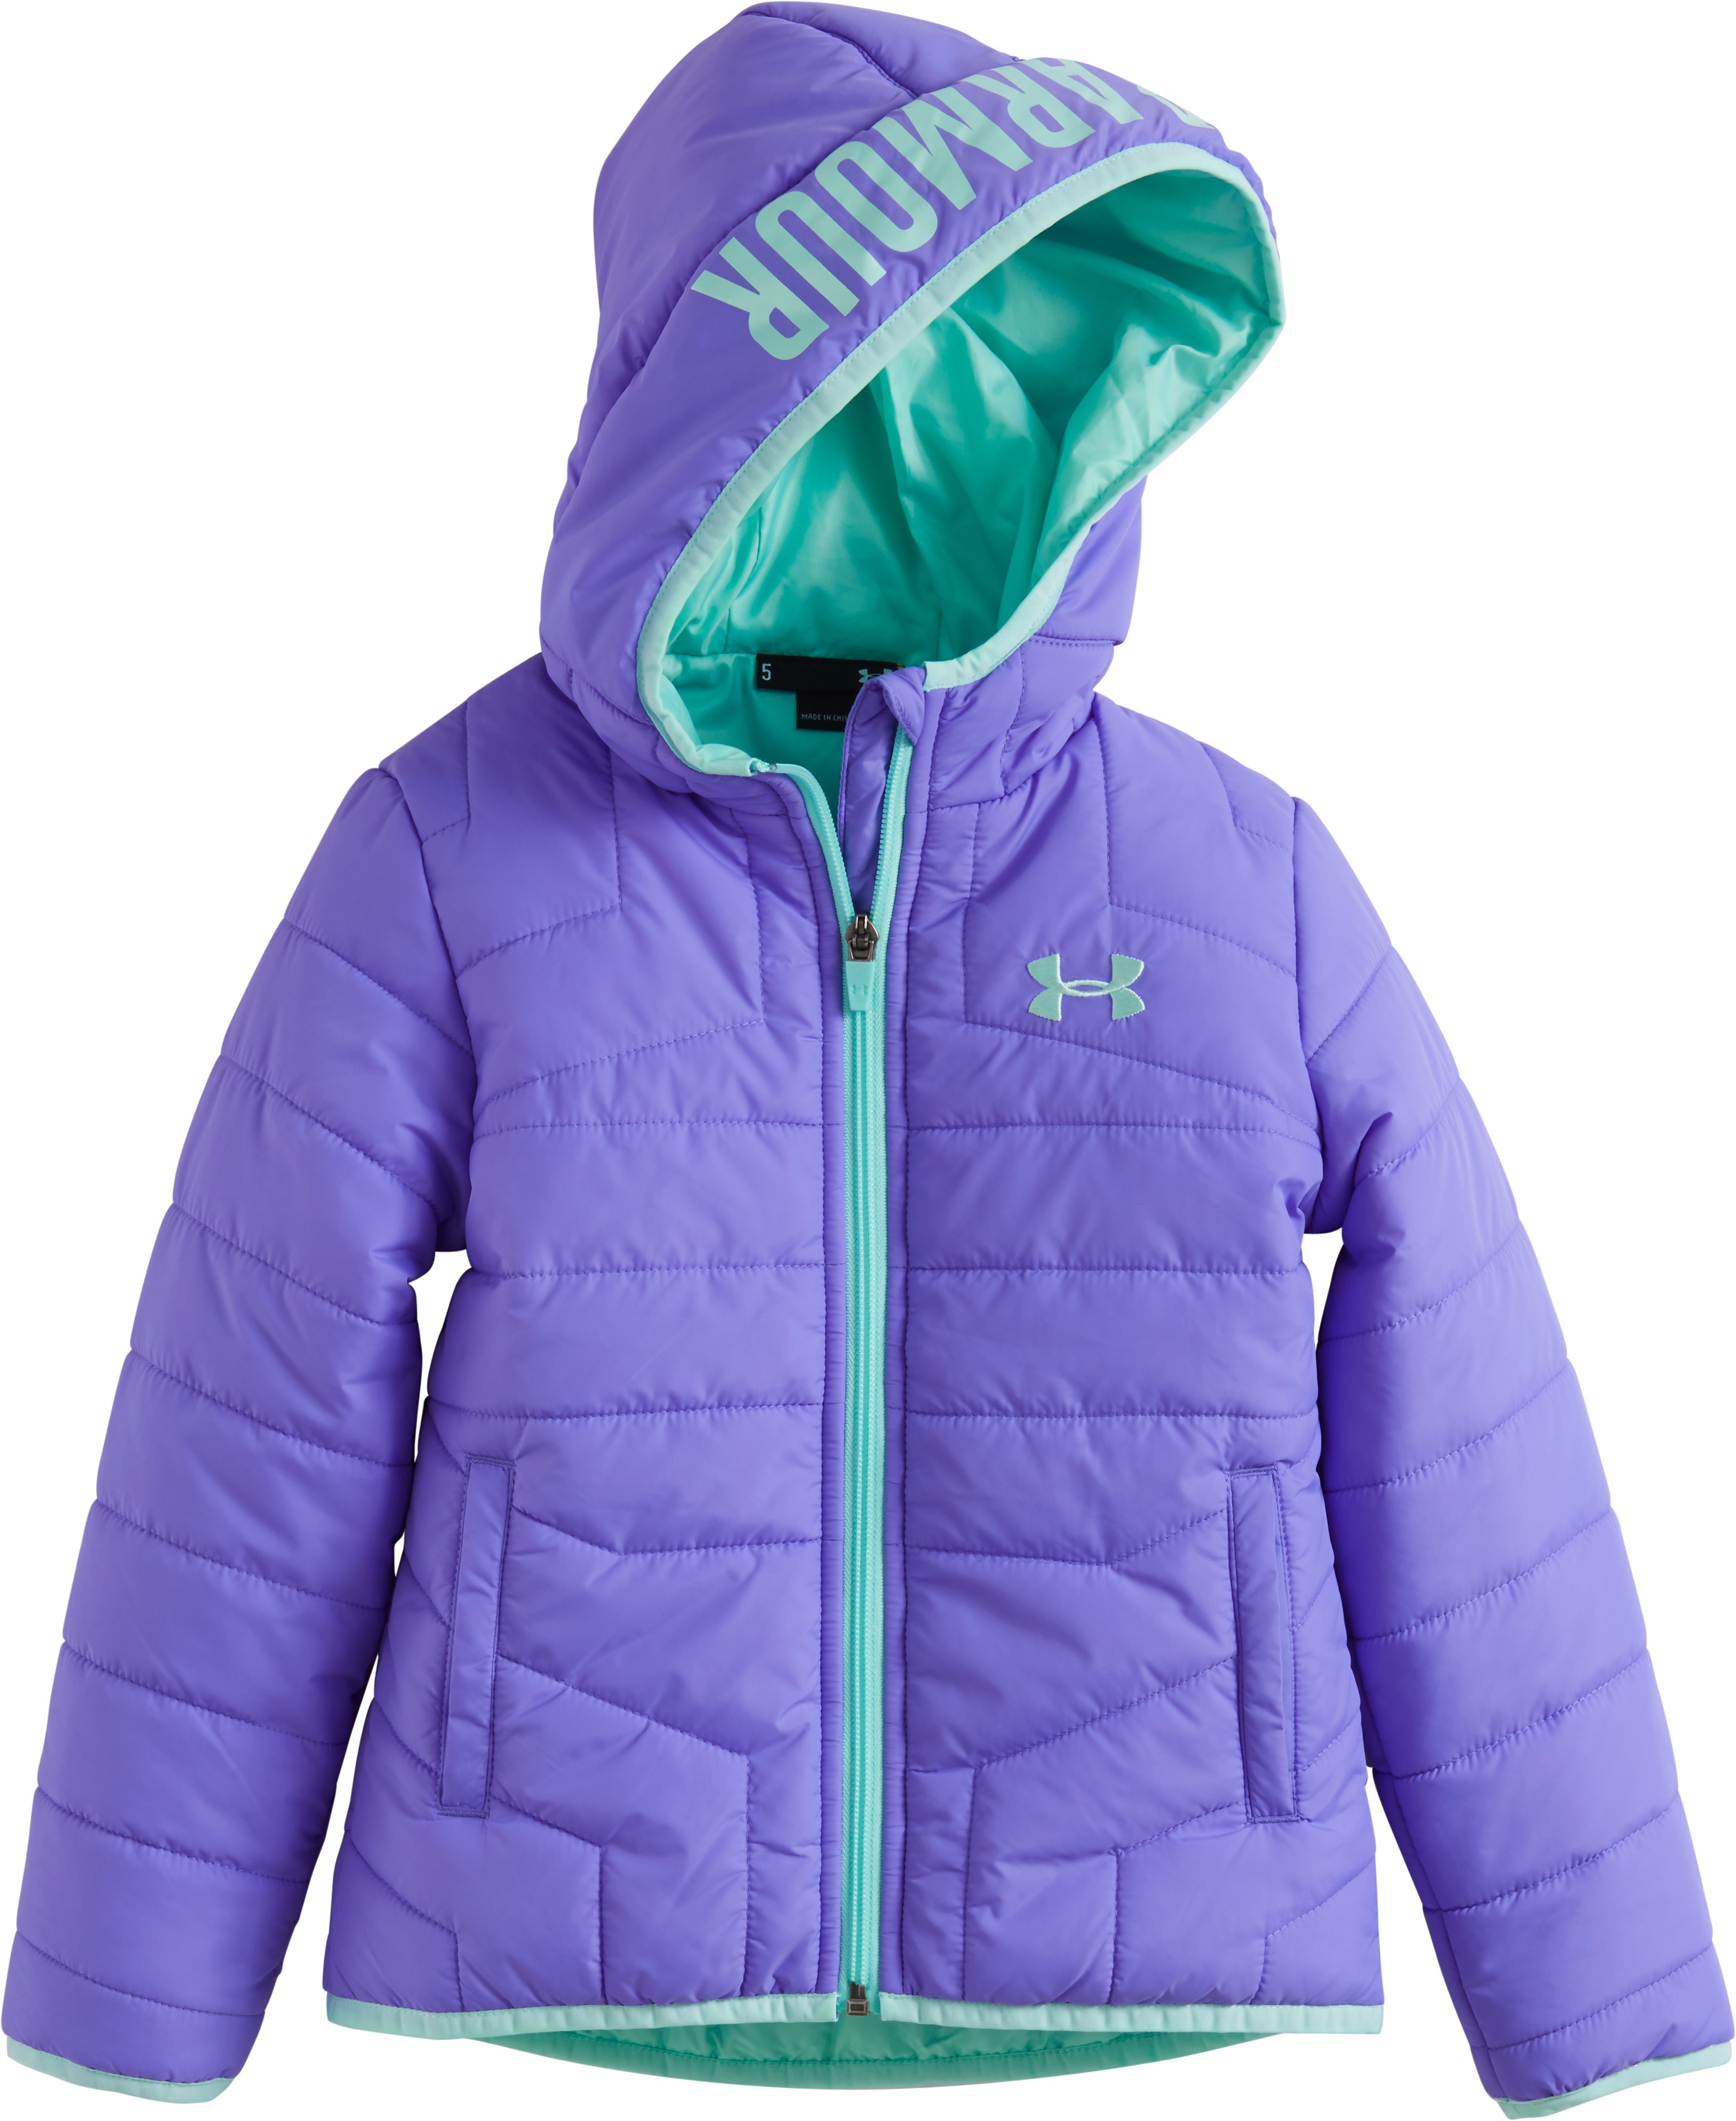 Girlsu0026#39; Toddler UA Feature Puffer Jacket | Under Armour US